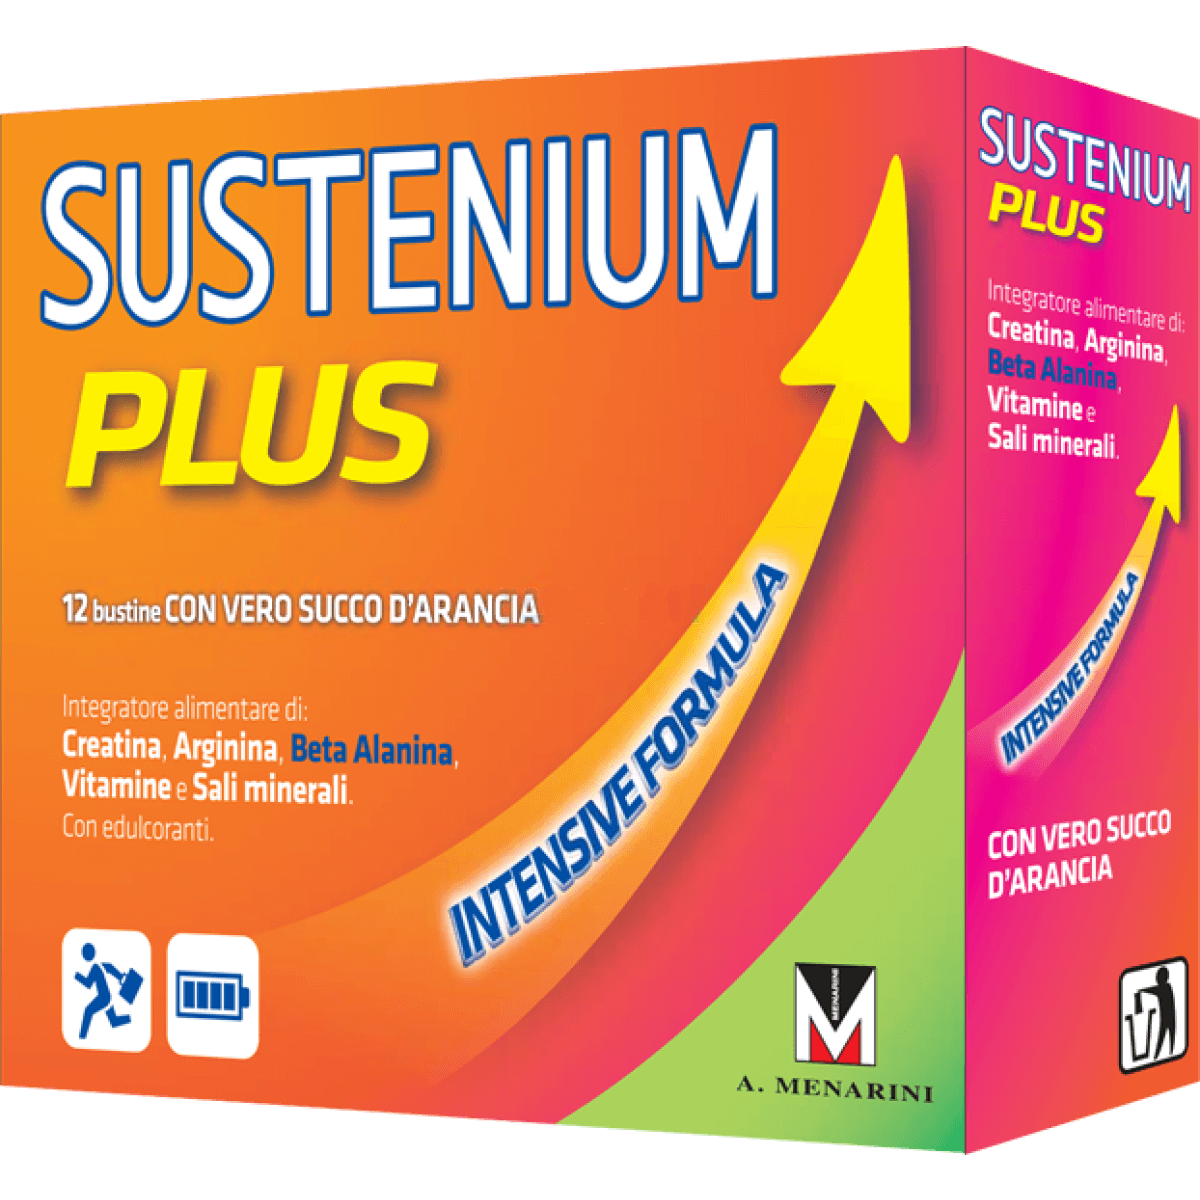 Menarini Sustenium Plus Συμπλήρωμα Διατροφής με Κρεατίνη, Αργινίνη, Βήτα-Αλανίνη, Βιταμίνες & Μέταλλα 22sachets